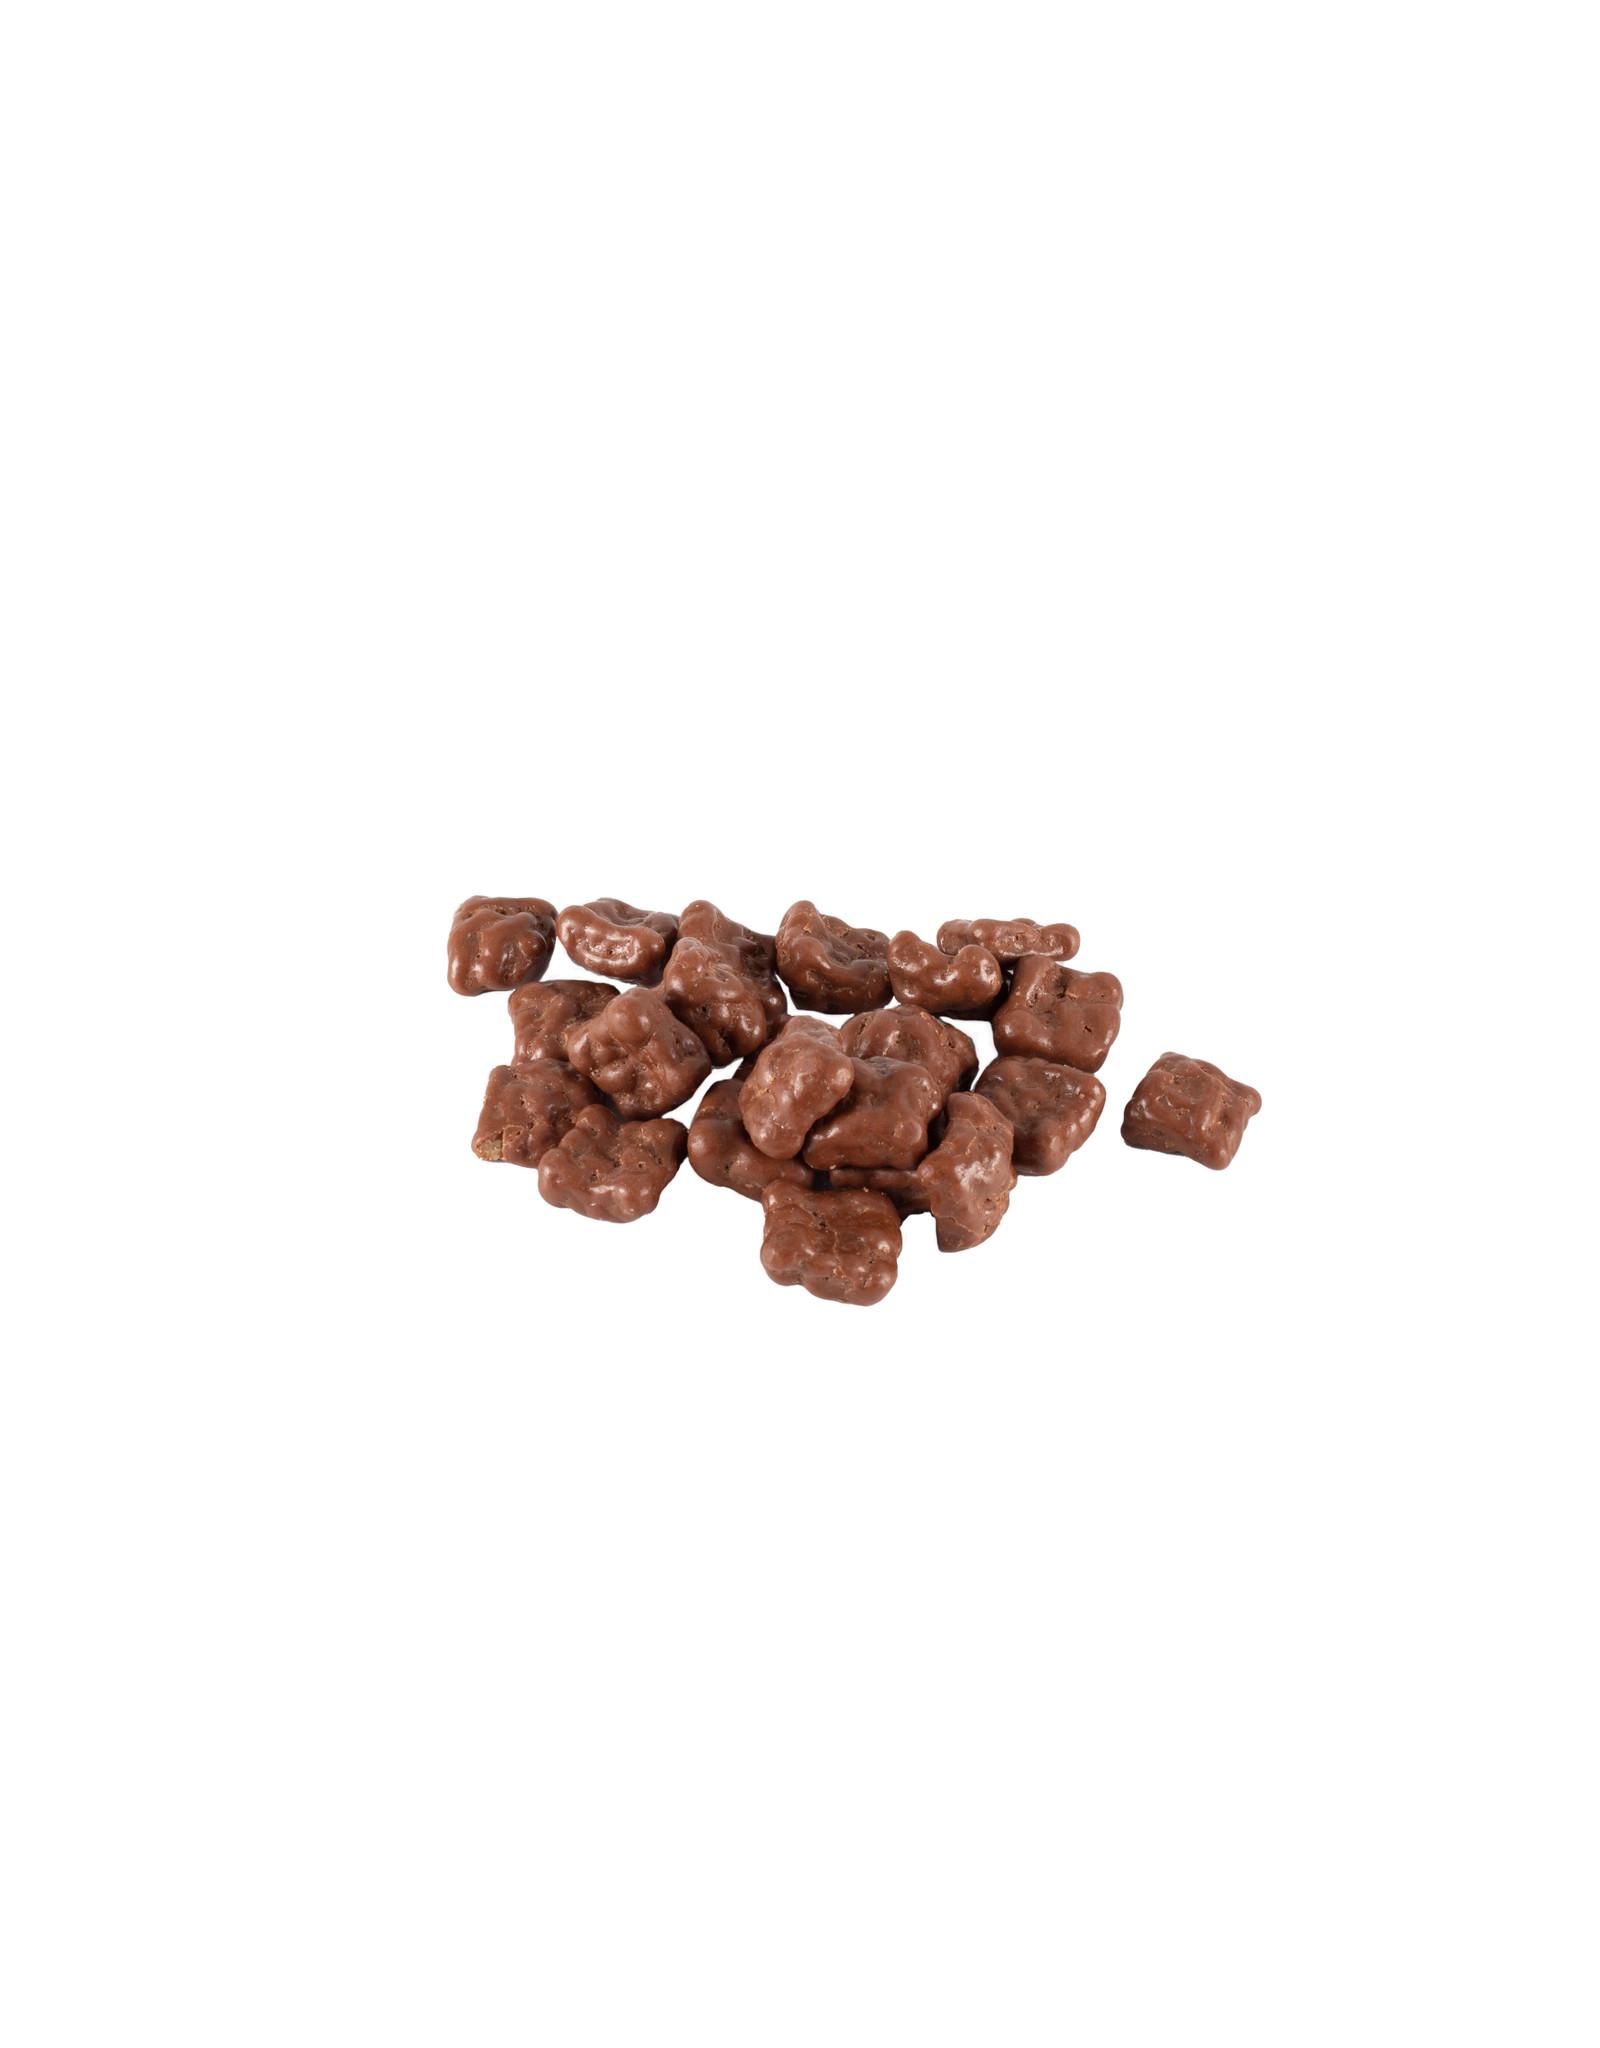 Max & Alex Max & Alex - Stroopwafelstukjes Melk Chocolade - 300 gram zakje